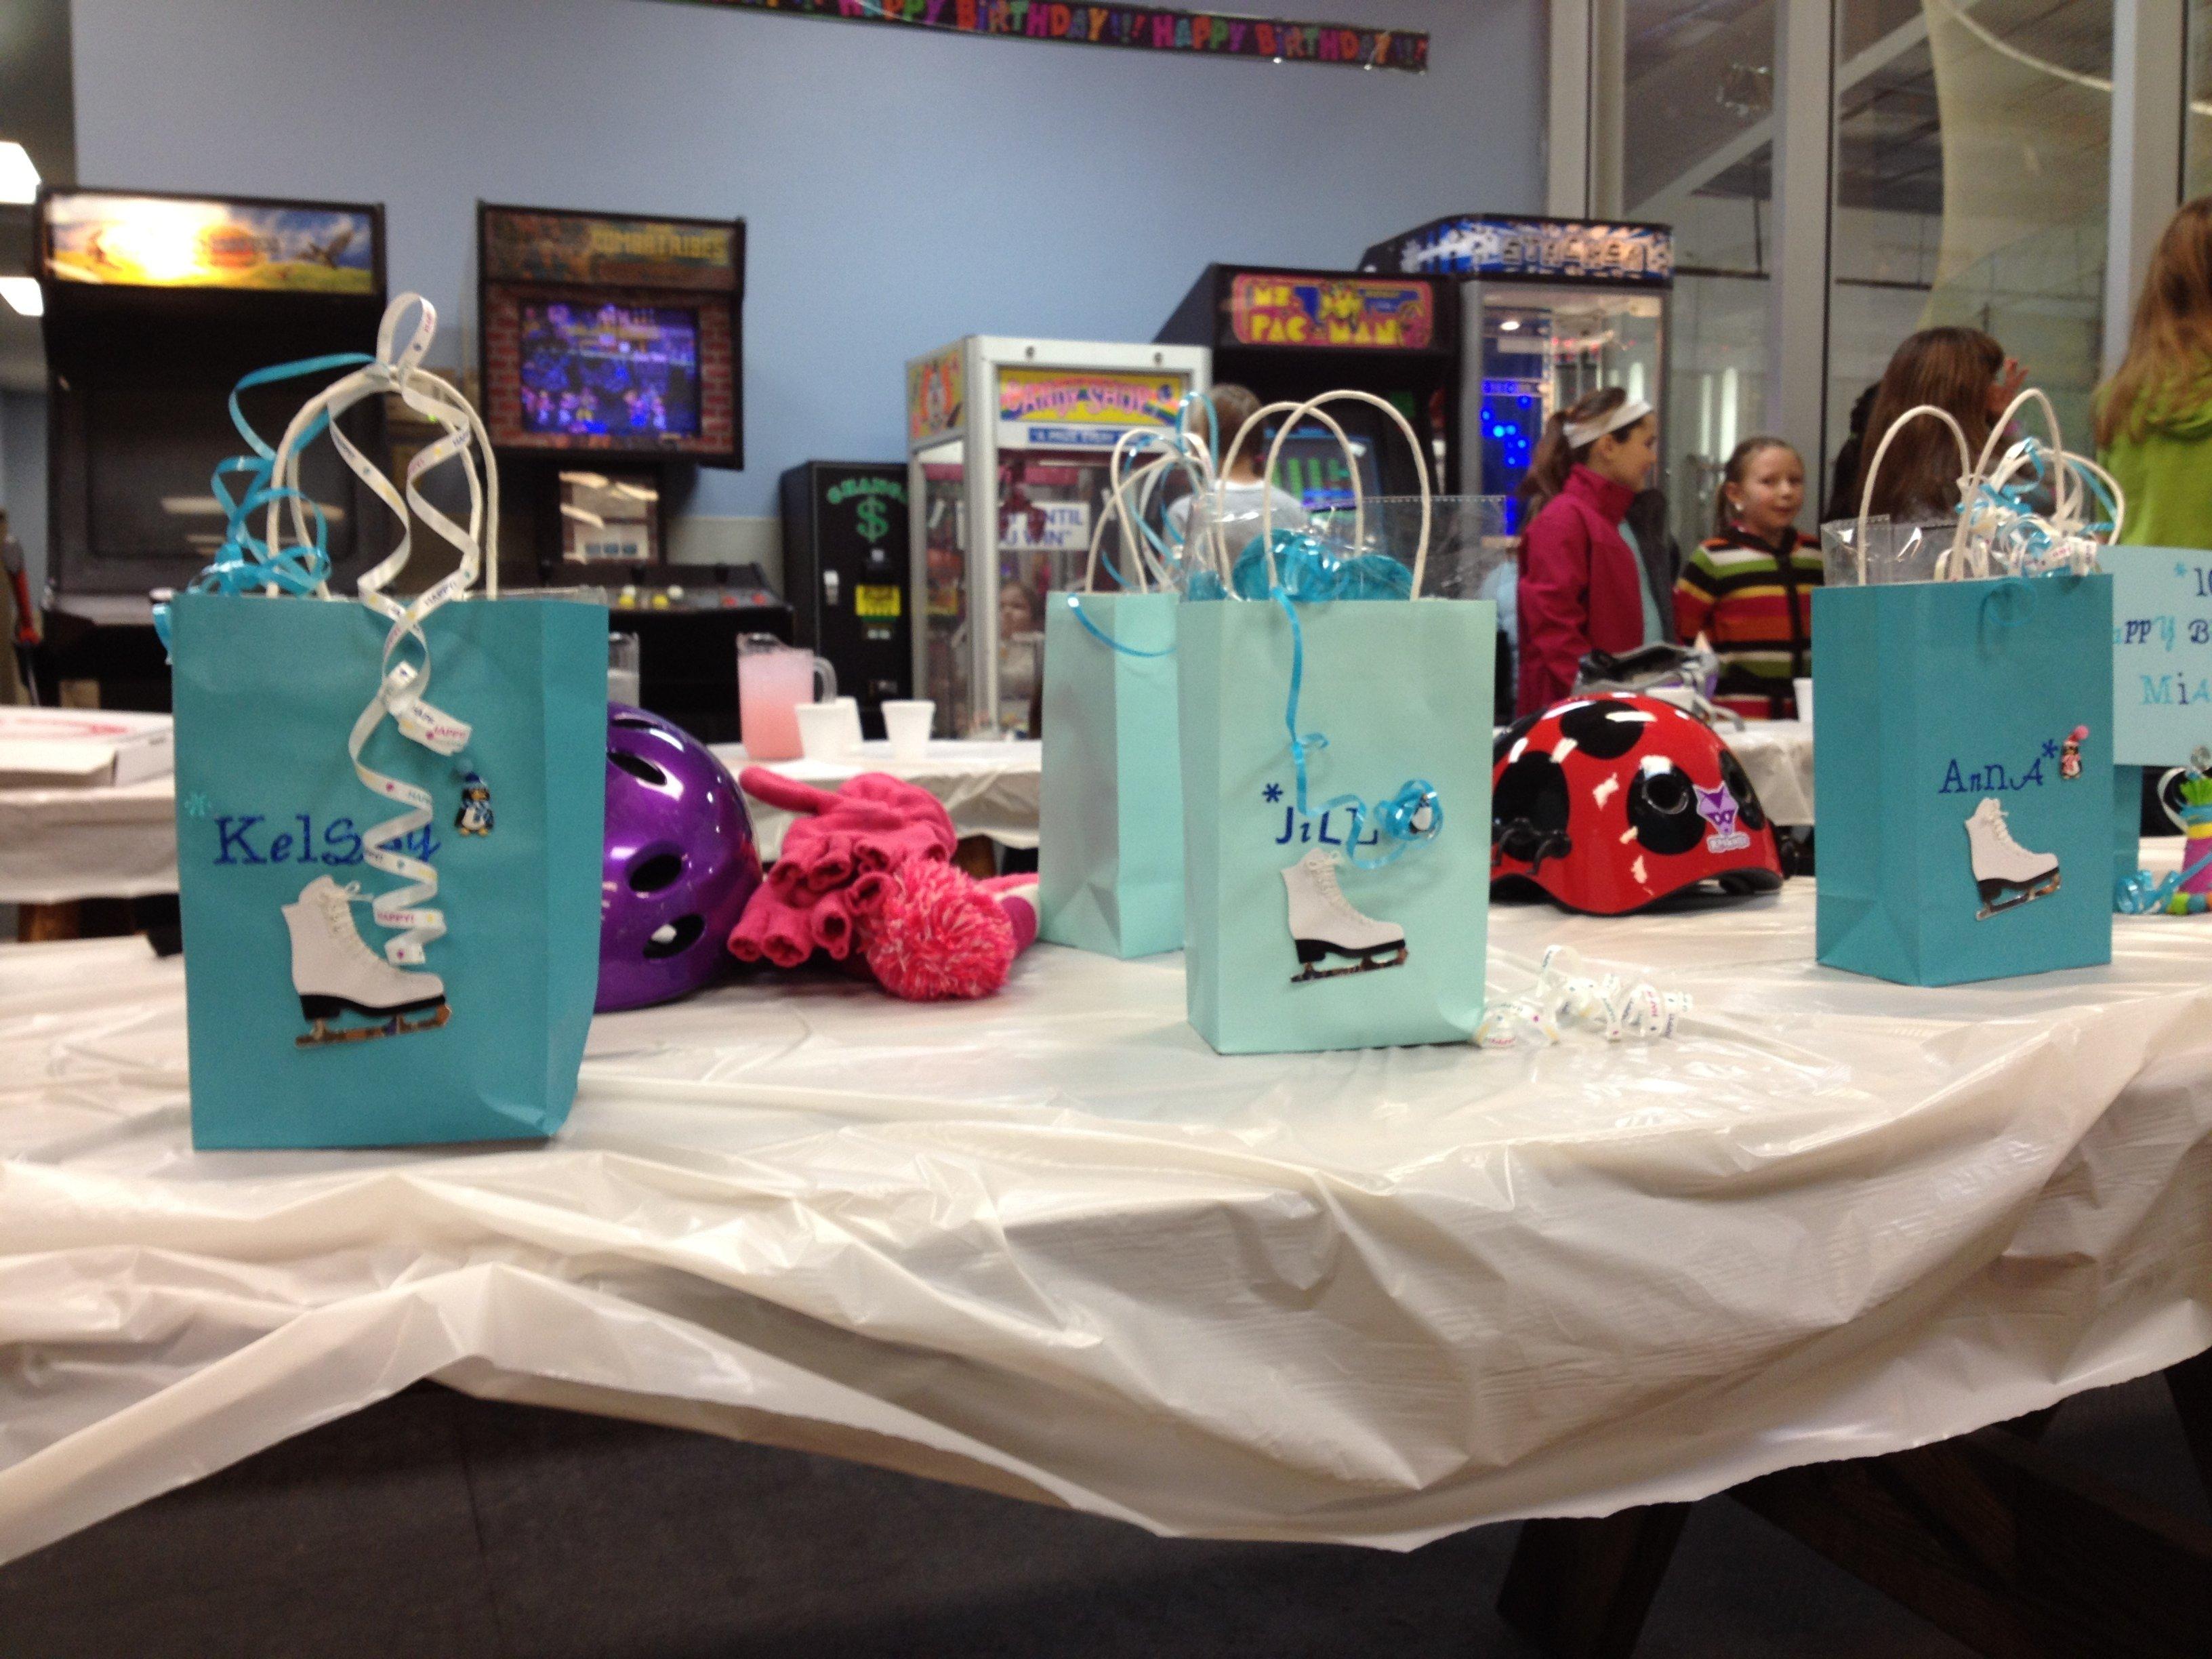 10 Fashionable Ice Skating Birthday Party Ideas birthday parties newington arena 2020